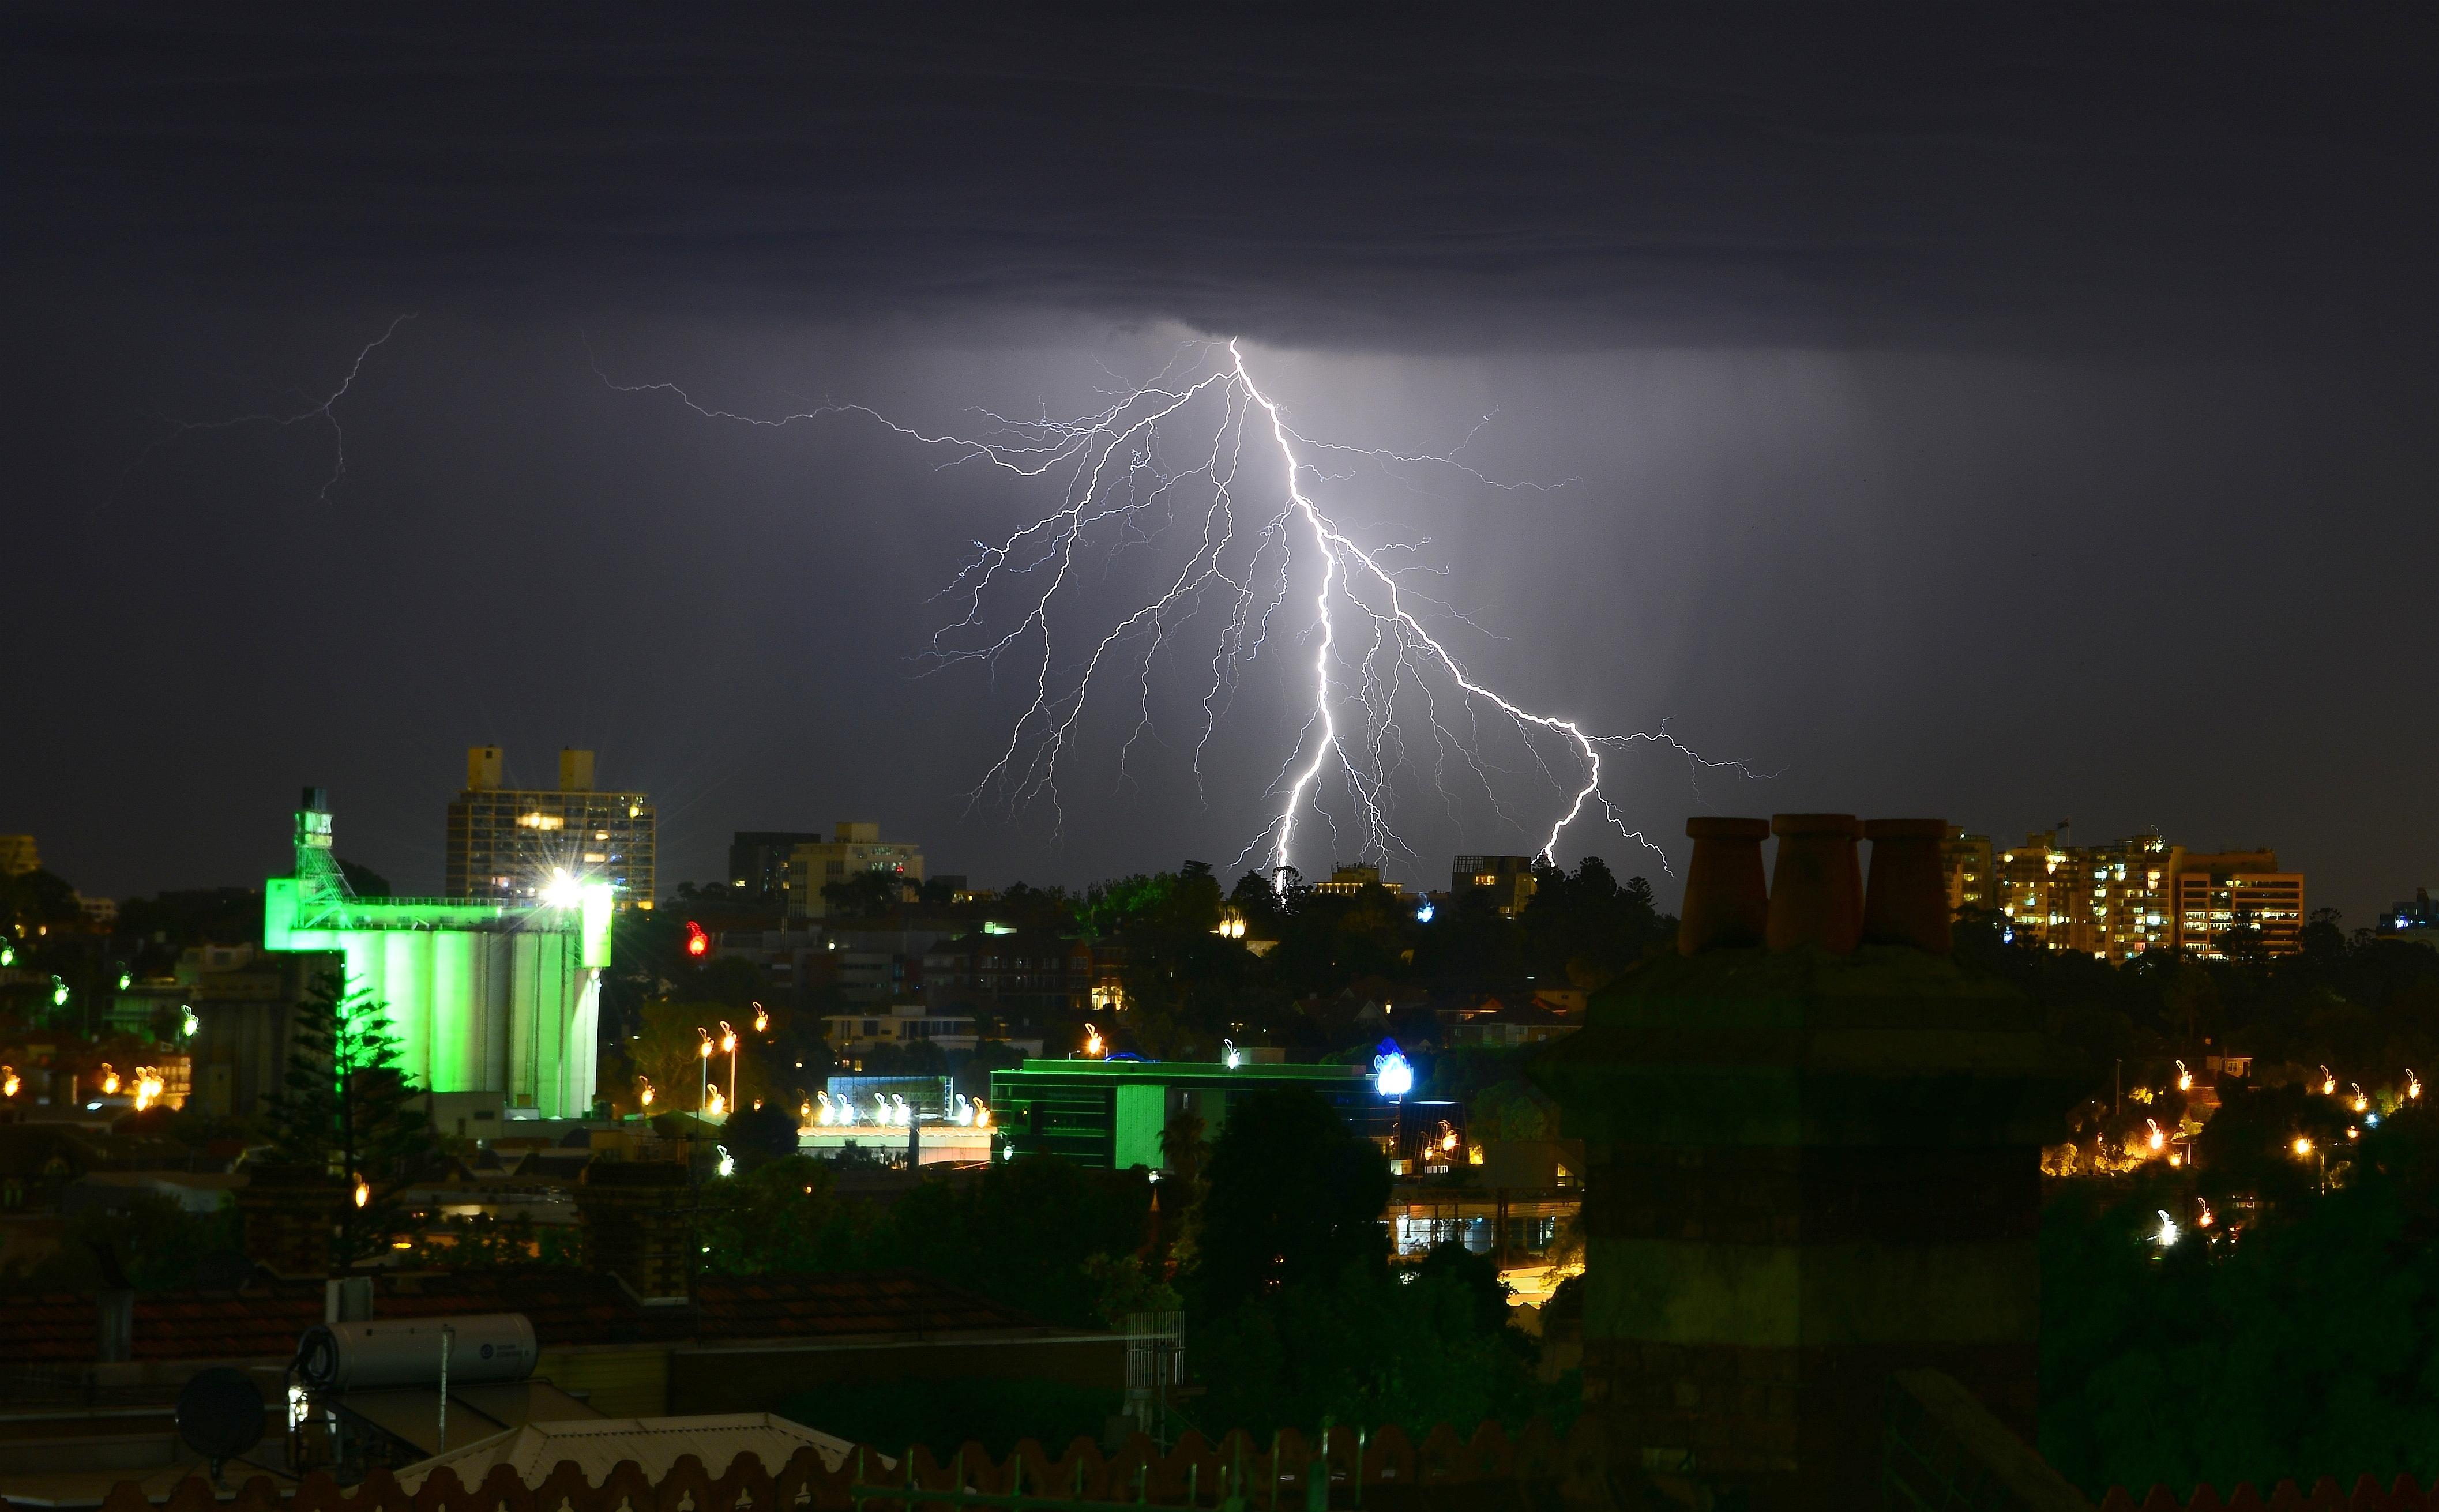 Severe storms in Australia   Wiki   Everipedia